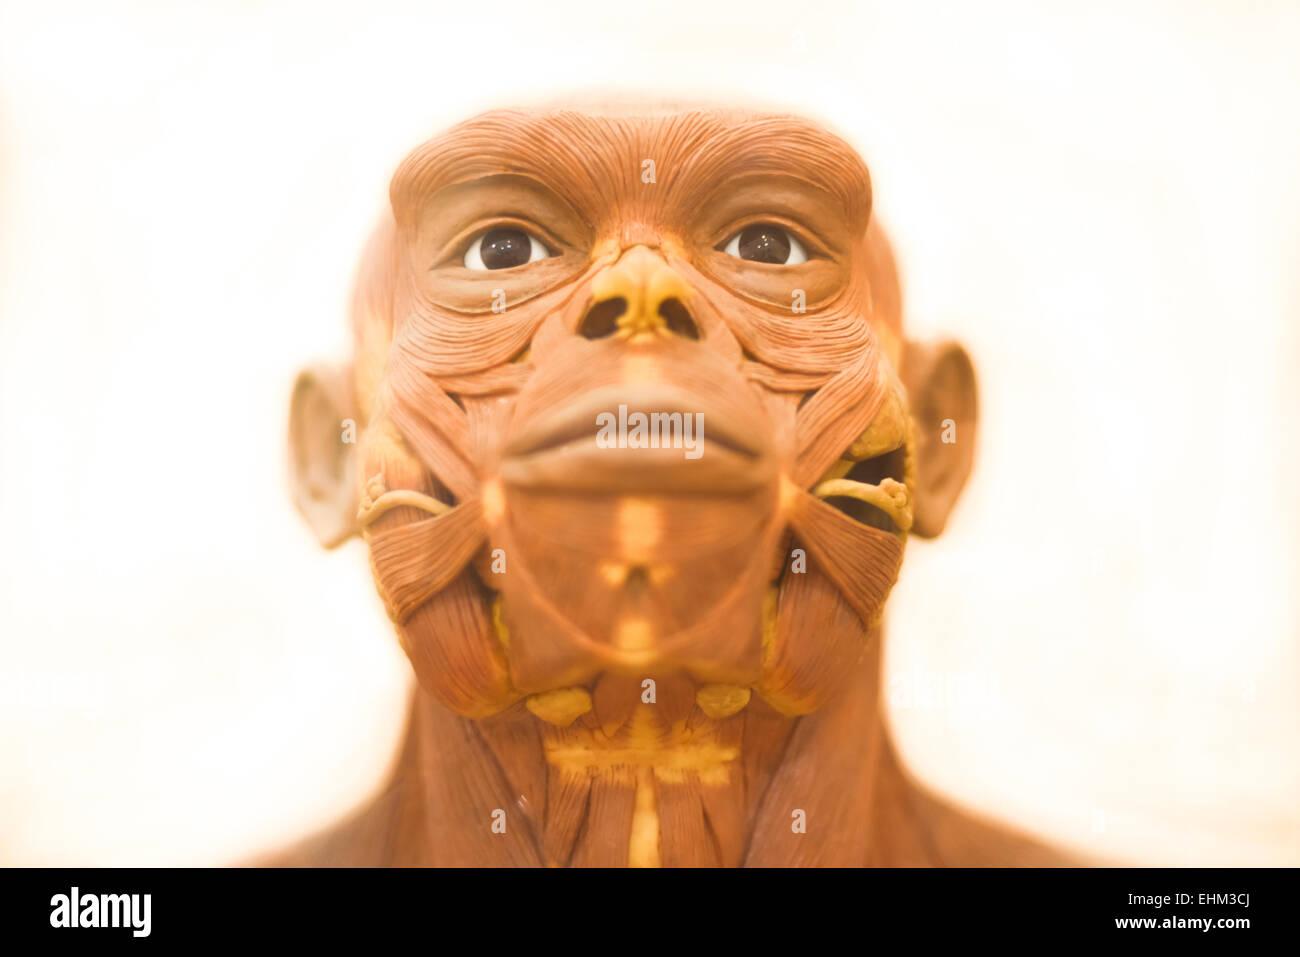 Bandung, Indonesia. 15th Mar, 2015. Details of life-sized reconstruction of Homo erectus by Yoichi Yazawa at Geology - Stock Image